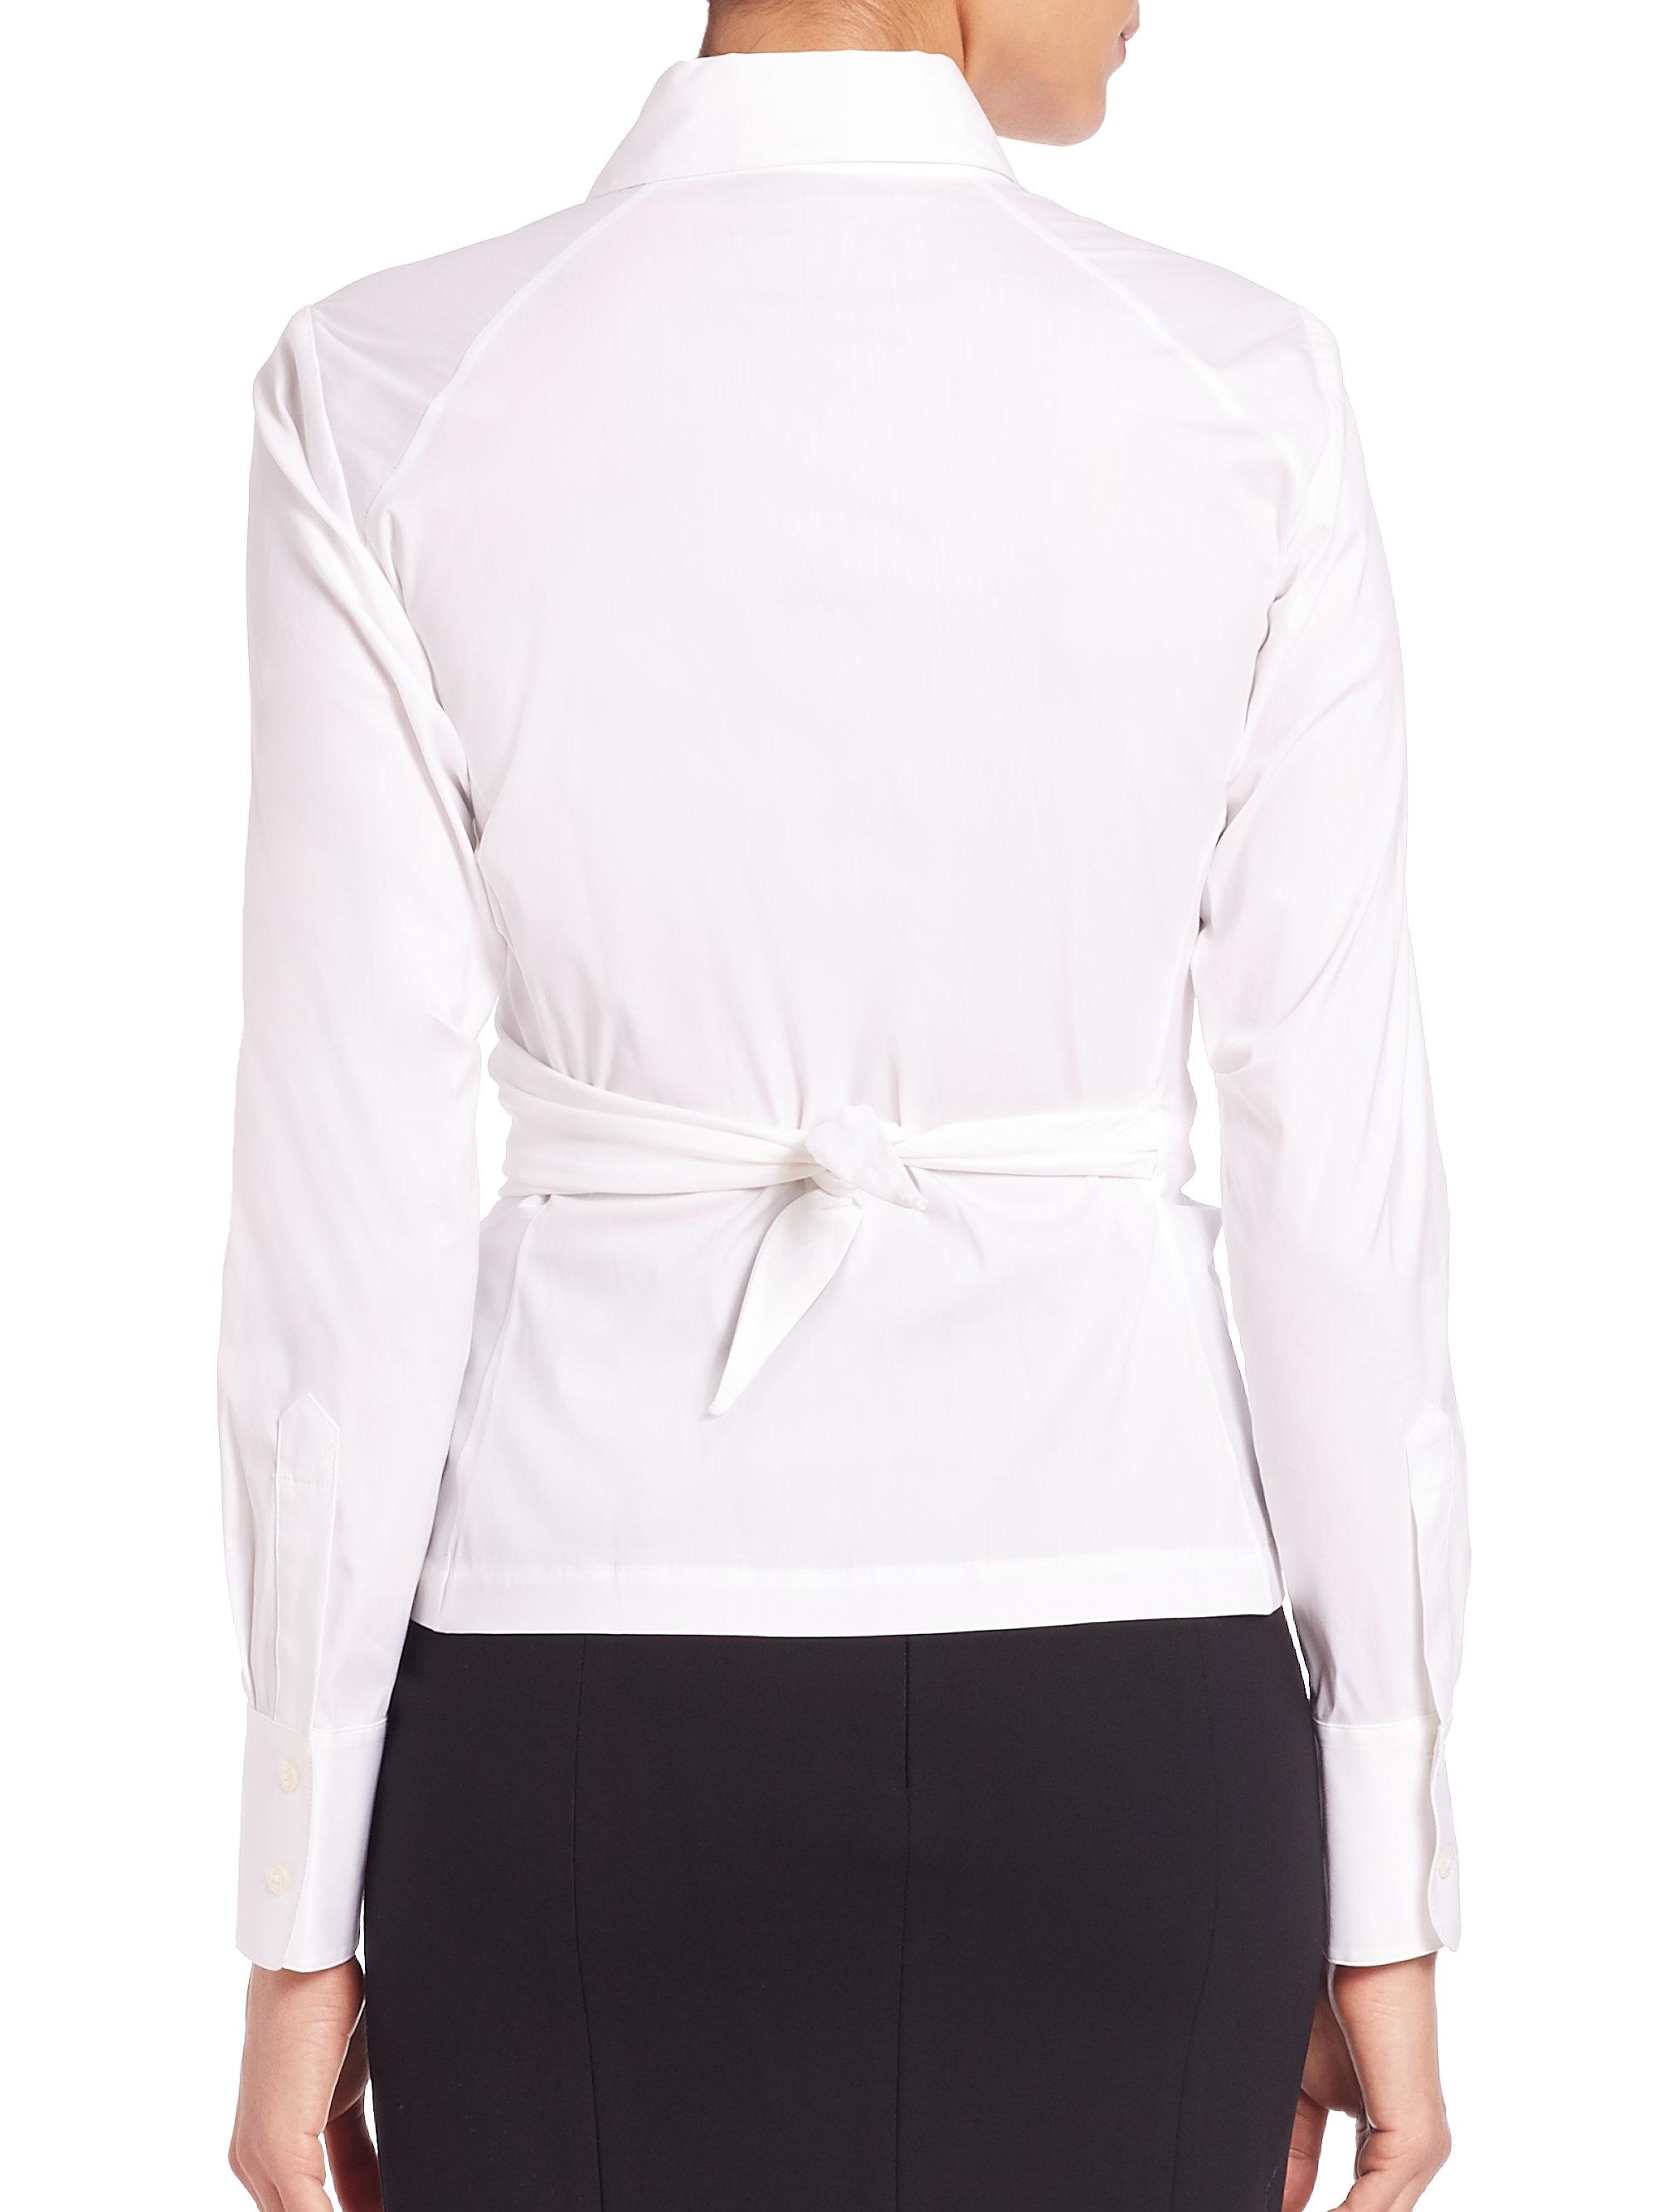 Donna karan Stretch-cotton Wrap Shirt in White | Lyst